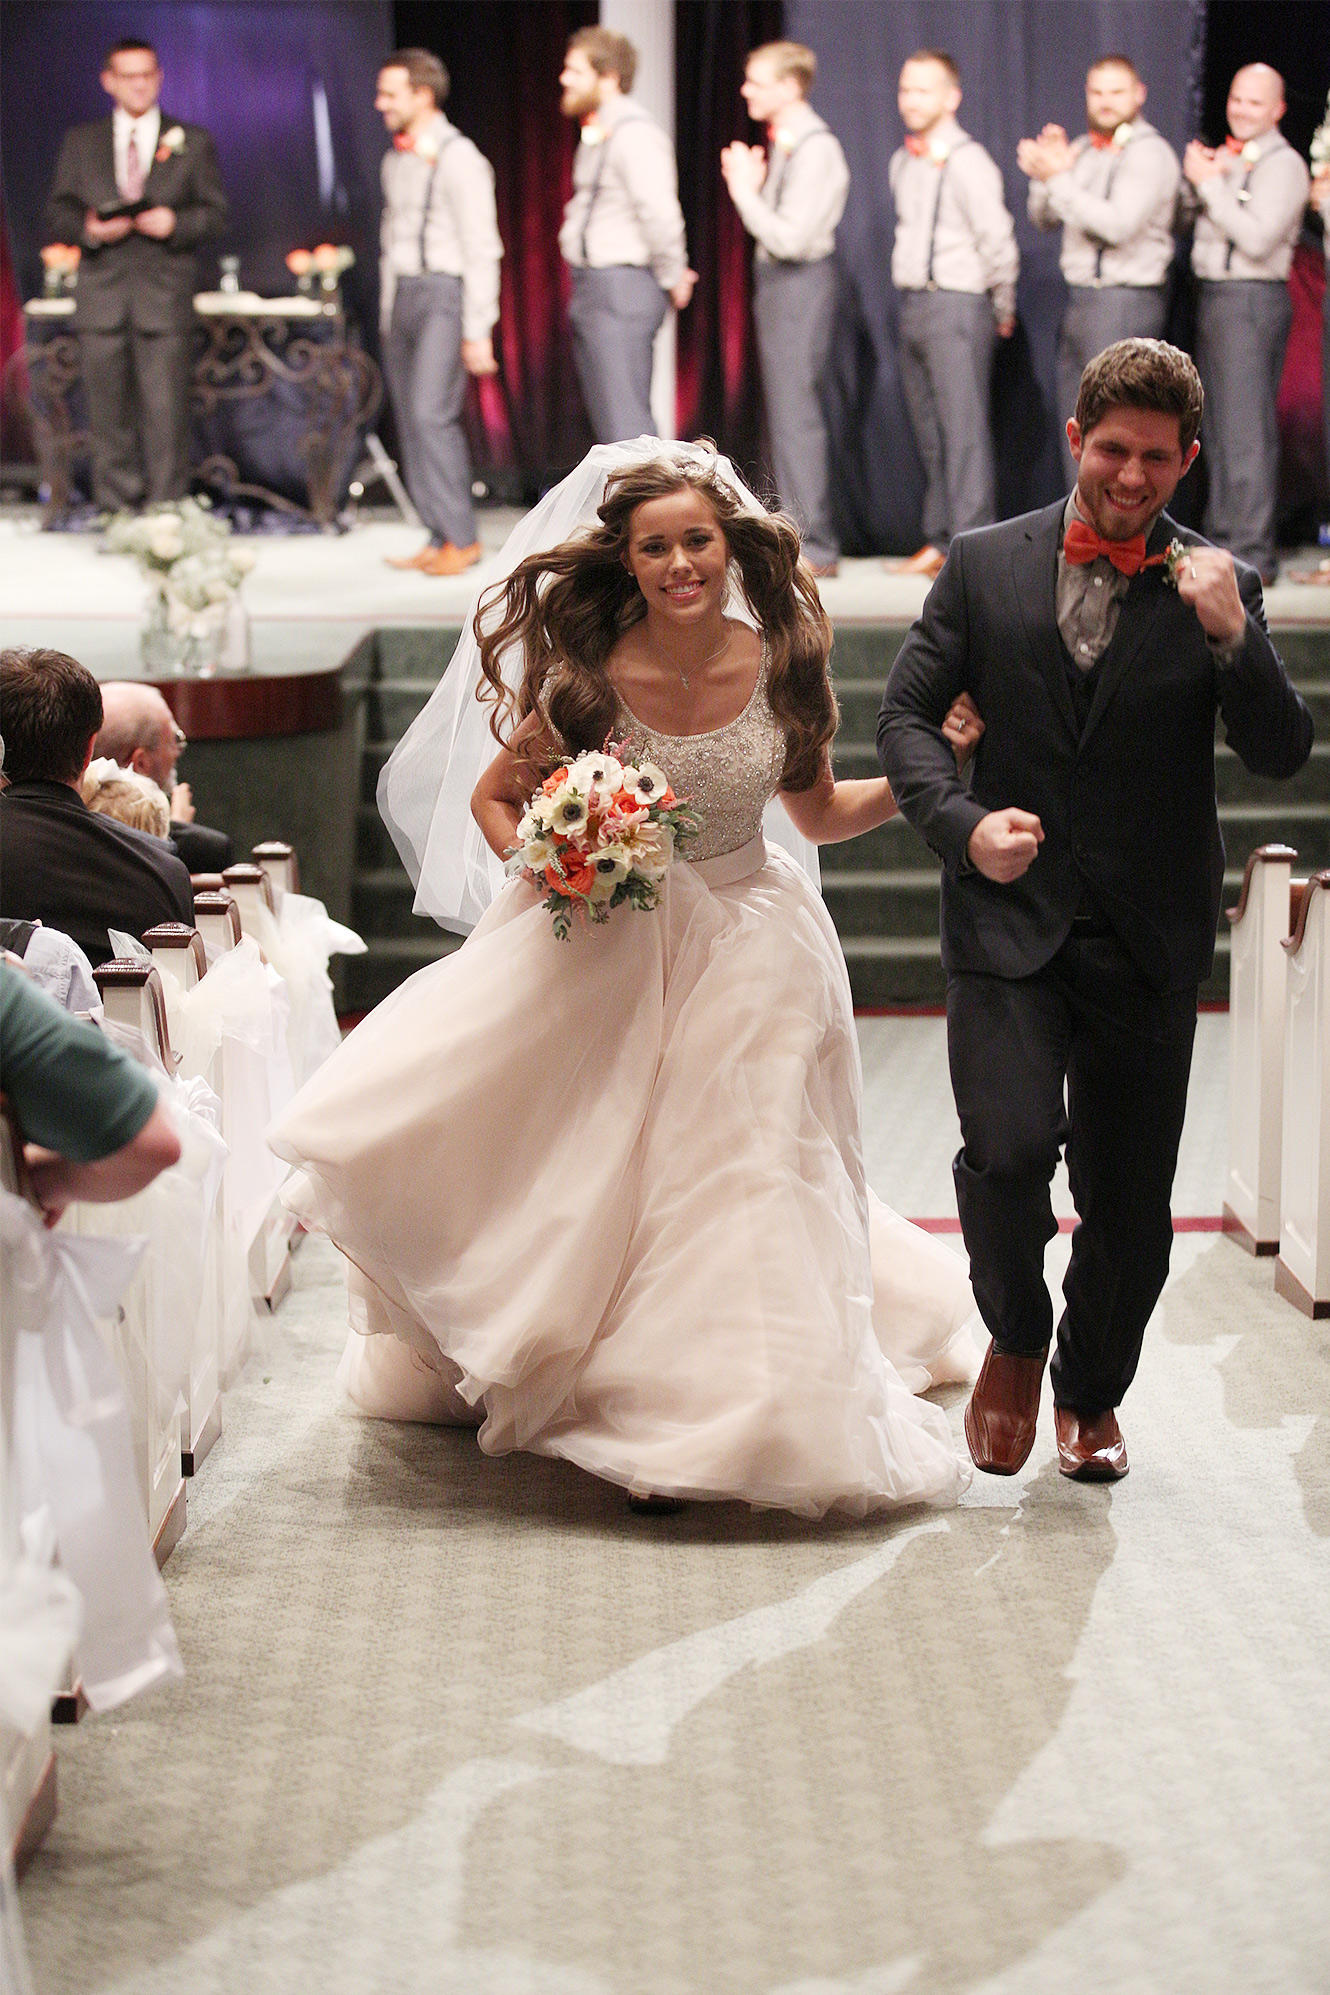 Wedding Jessa Wedding Dress jessa duggar and ben seewalds romantic wedding photo gallery 19 kids 16